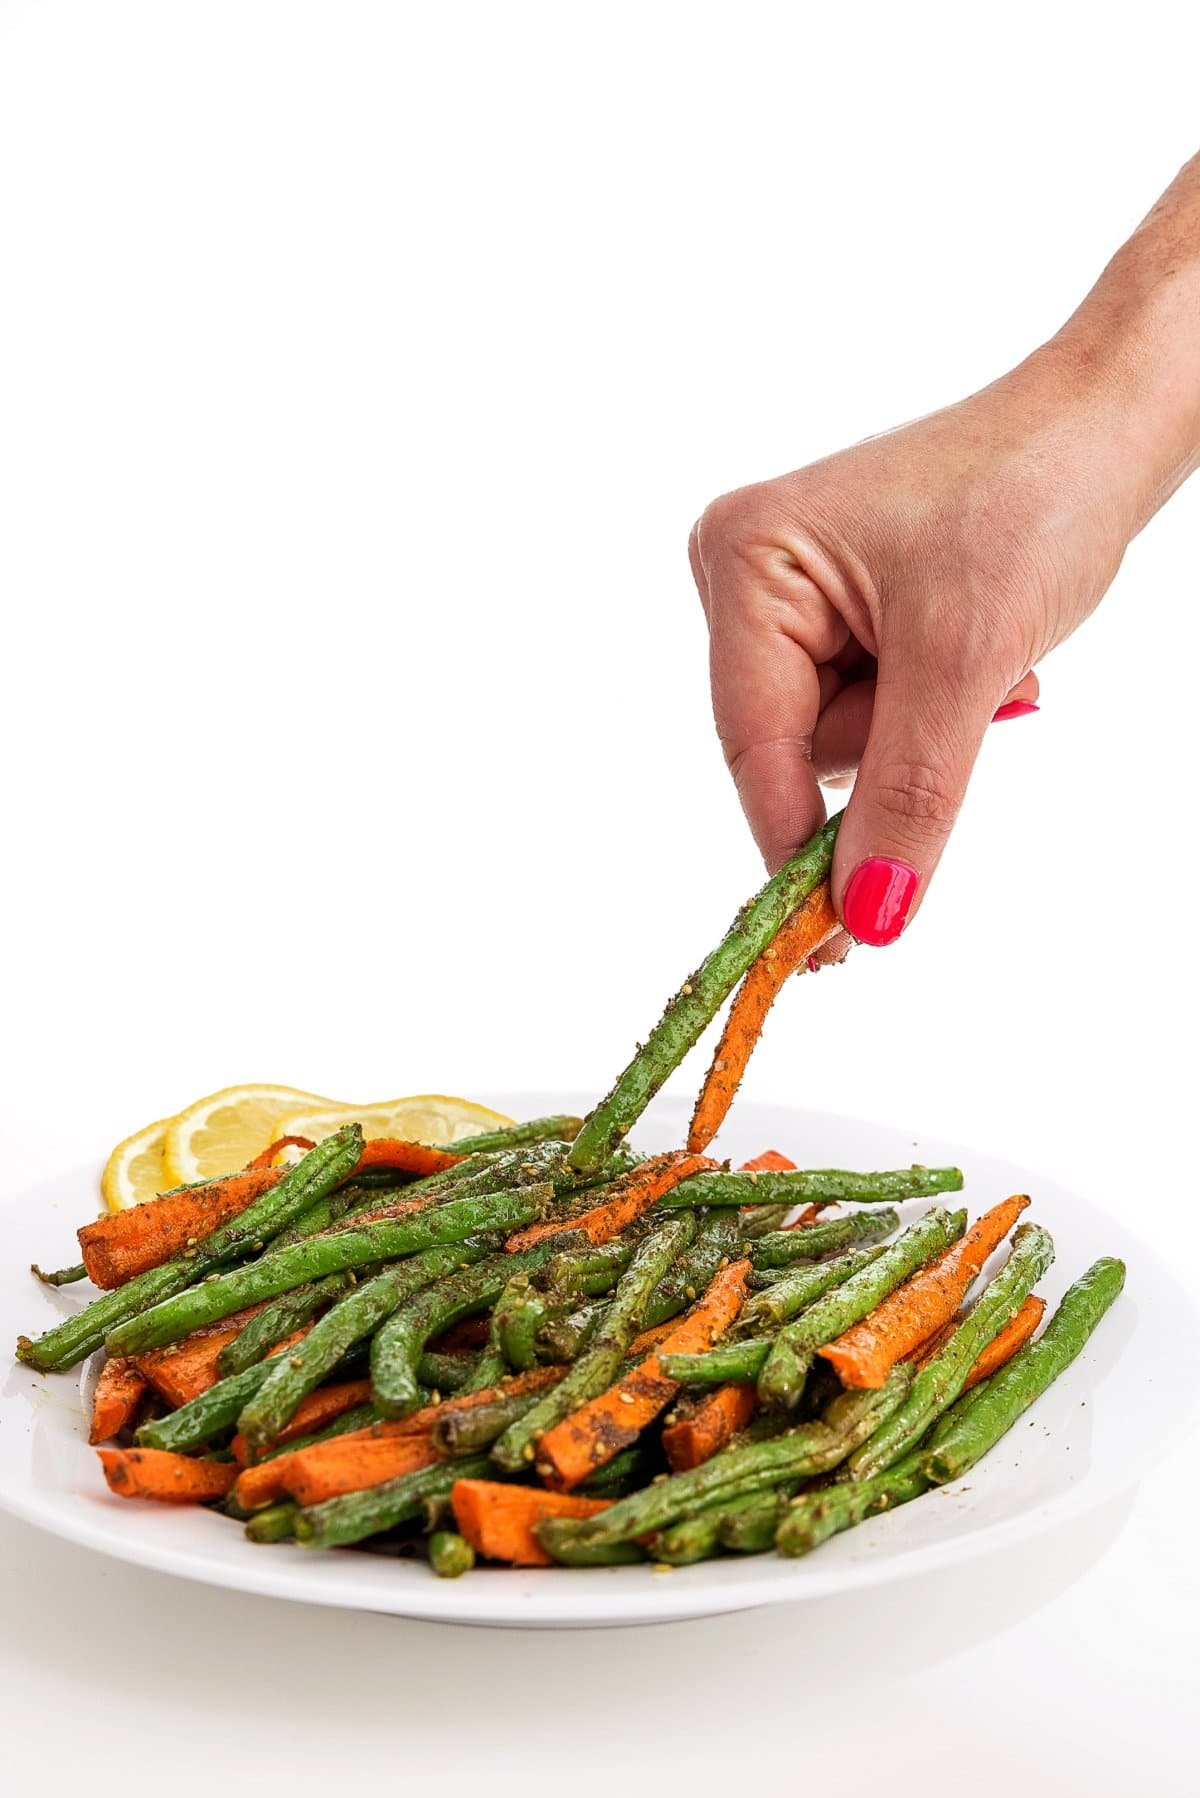 Grabbing roasted carrots and green beans with za'atar.